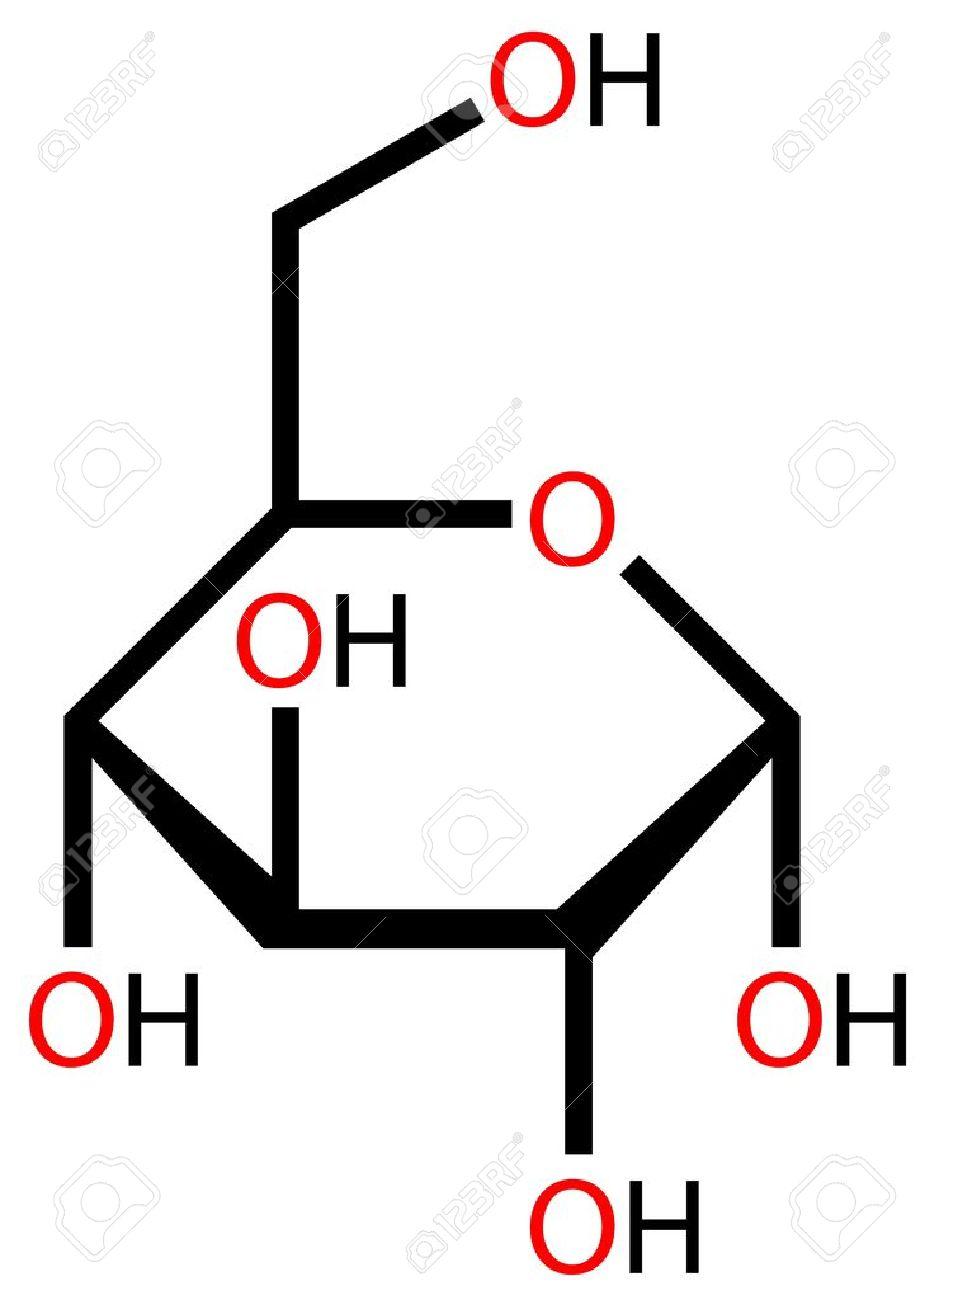 Glucose alpha d glucopyranose structural formula royalty free glucose alpha d glucopyranose structural formula stock vector 12416377 biocorpaavc Images